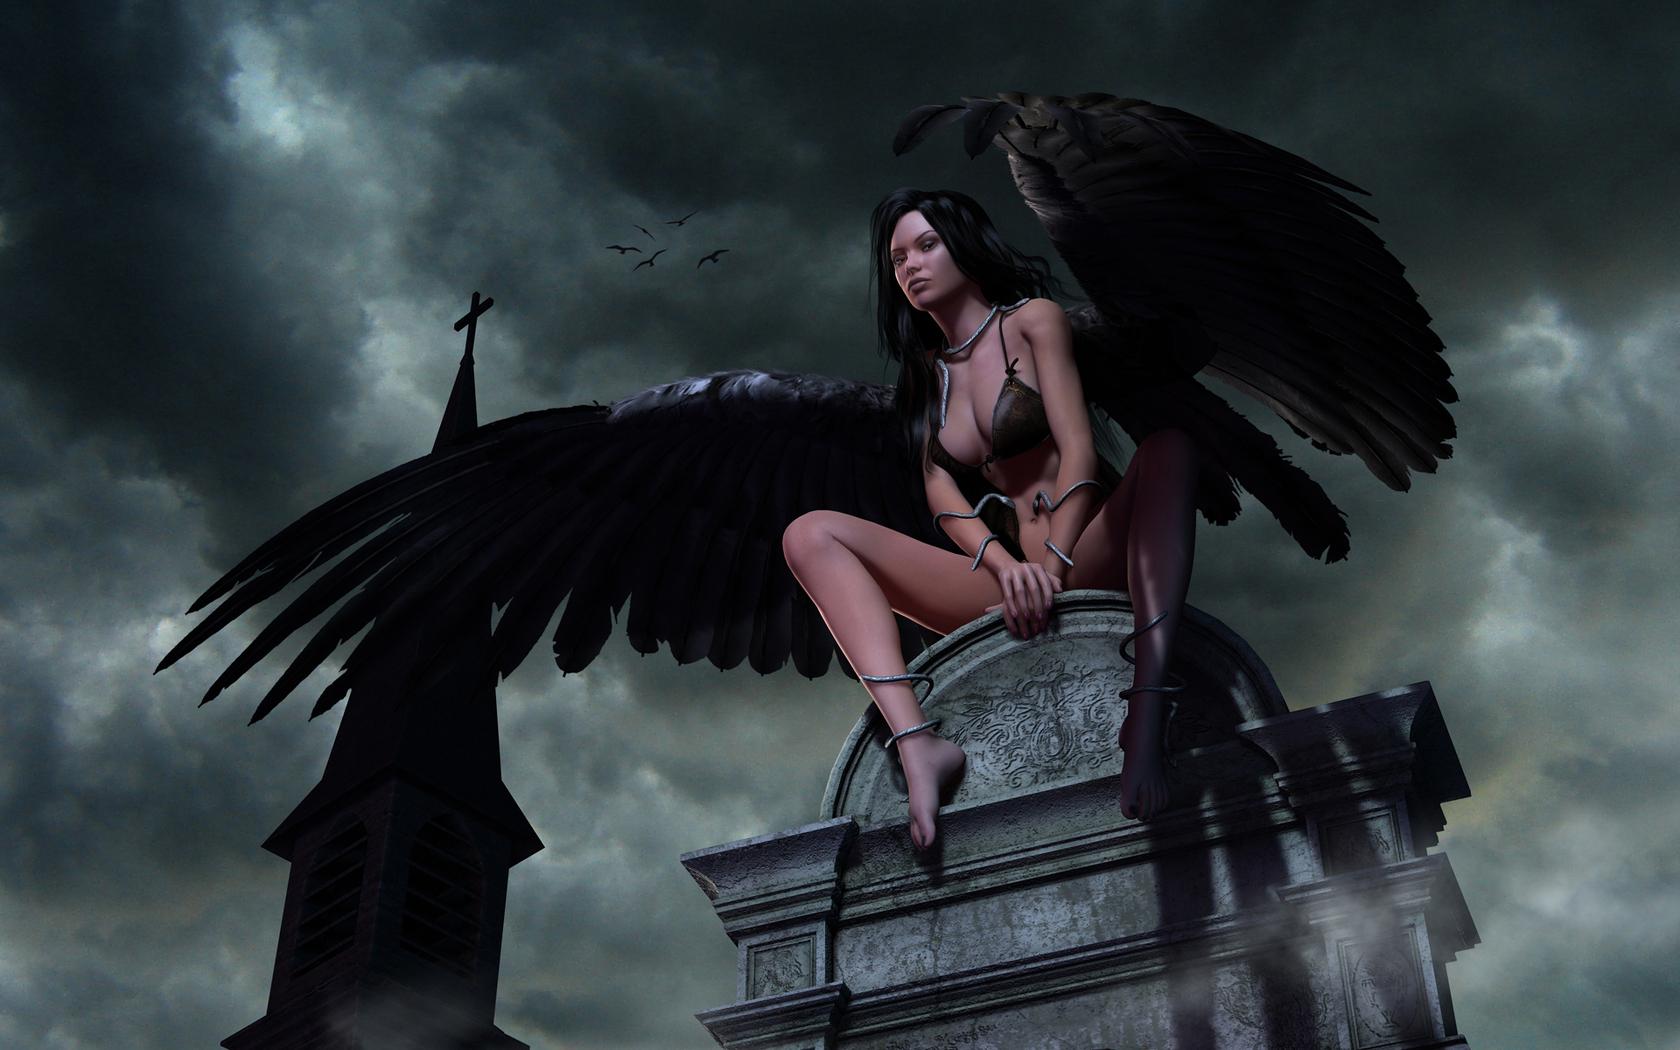 Black-Wings-D-wallpaper-wp4003583-1